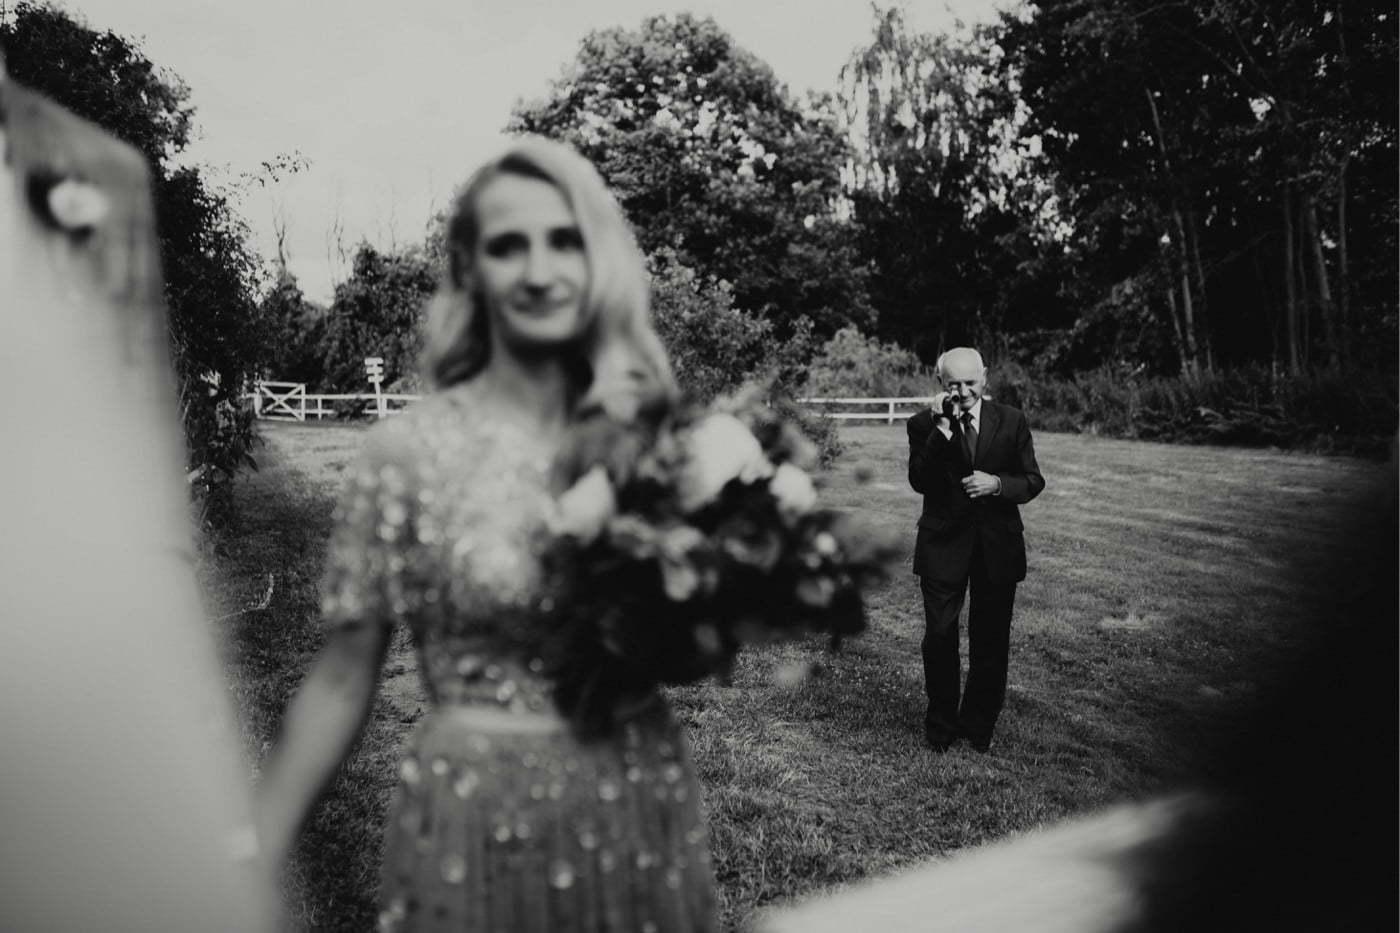 ewelina zieba rustykalne wesele stara oranzeria warszawa 053